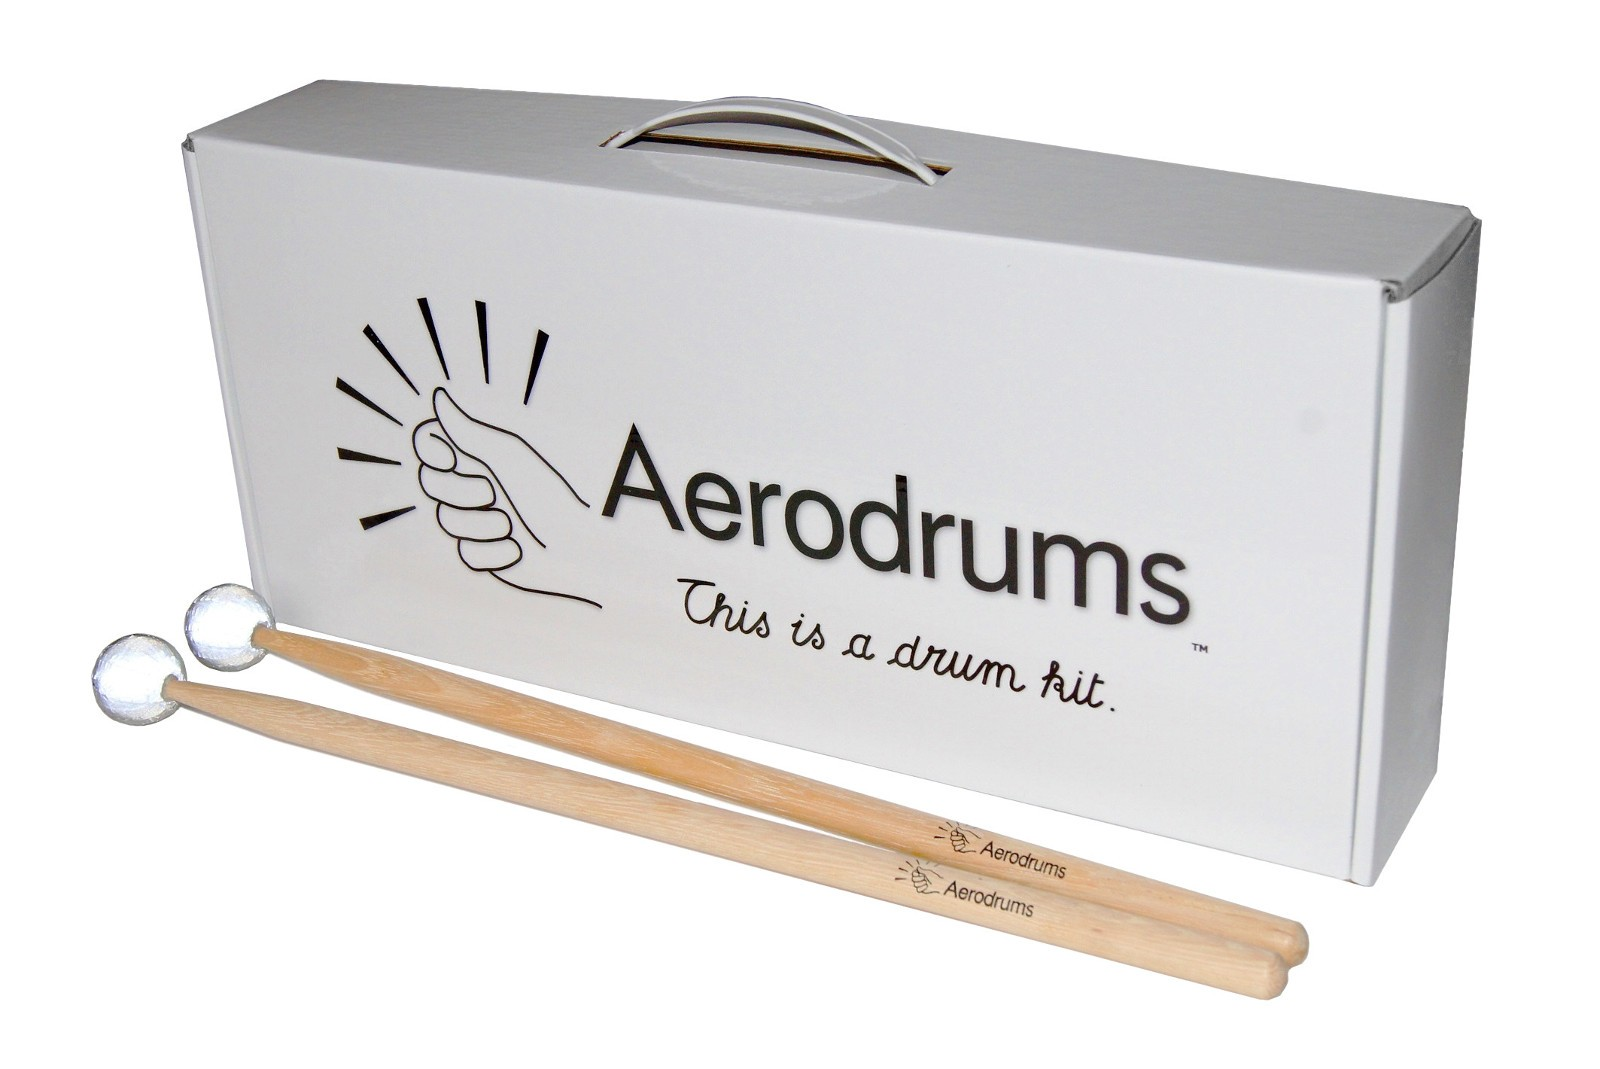 aerodrums